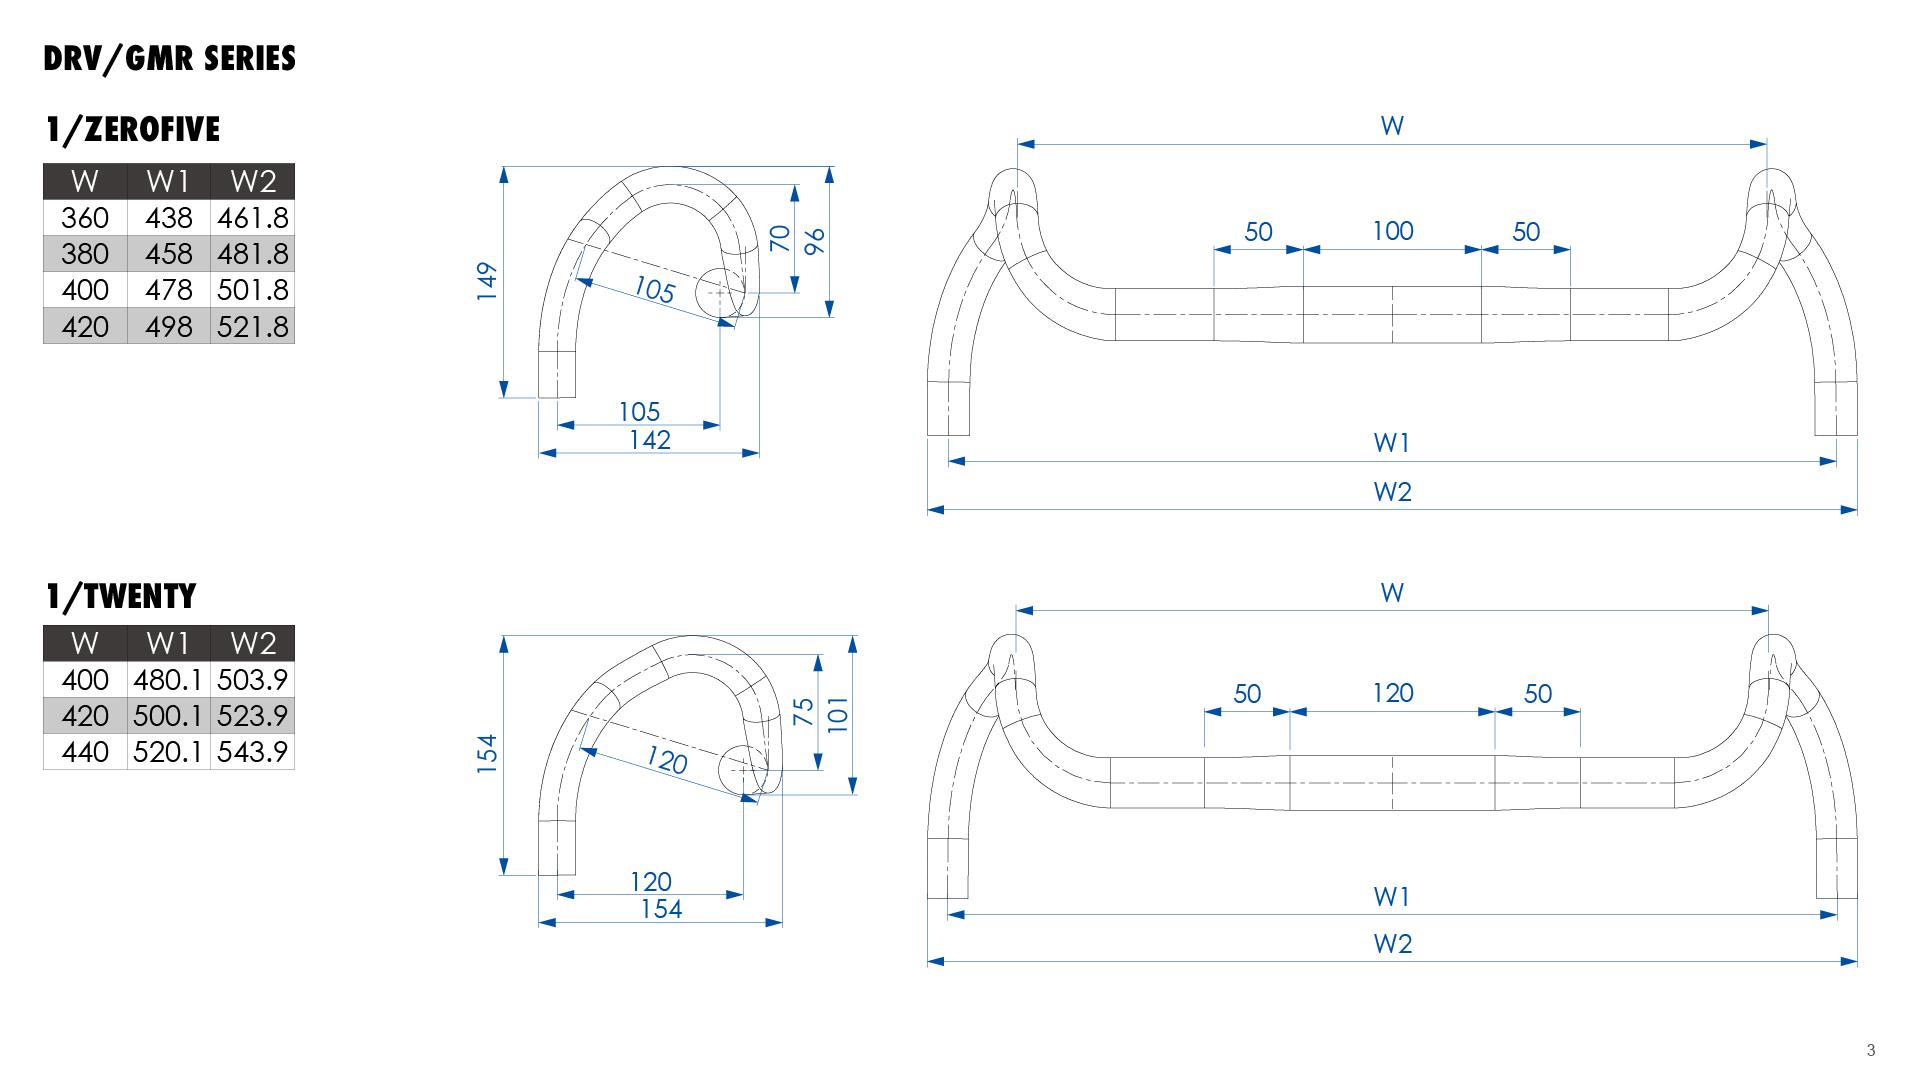 DRV-GMR-Detailed measurements